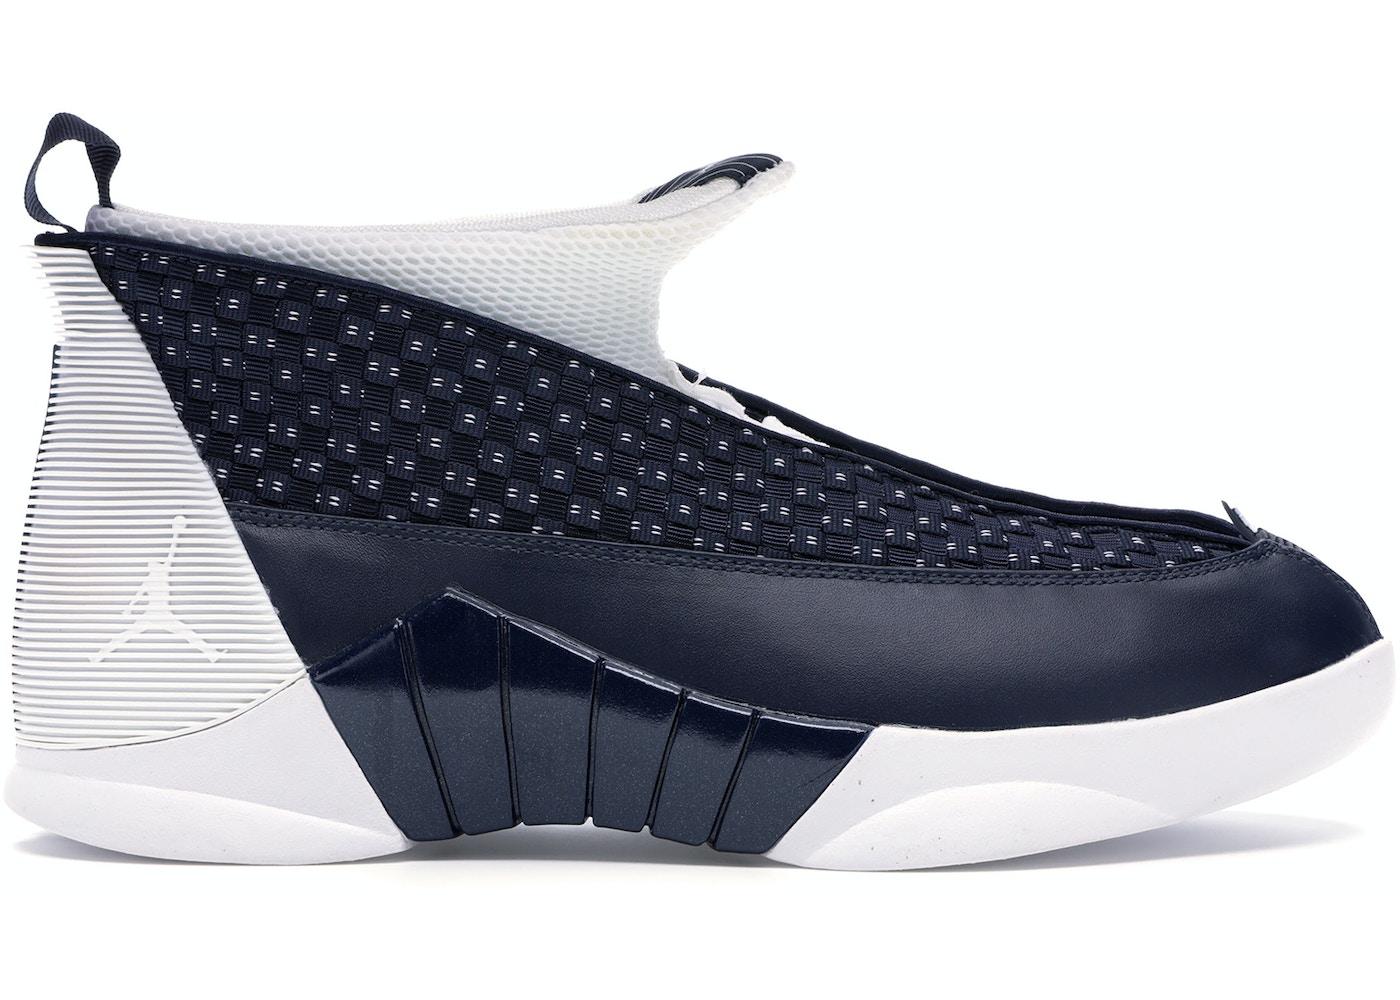 huge selection of 2f4d1 22232 Buy Air Jordan 15 Shoes   Deadstock Sneakers